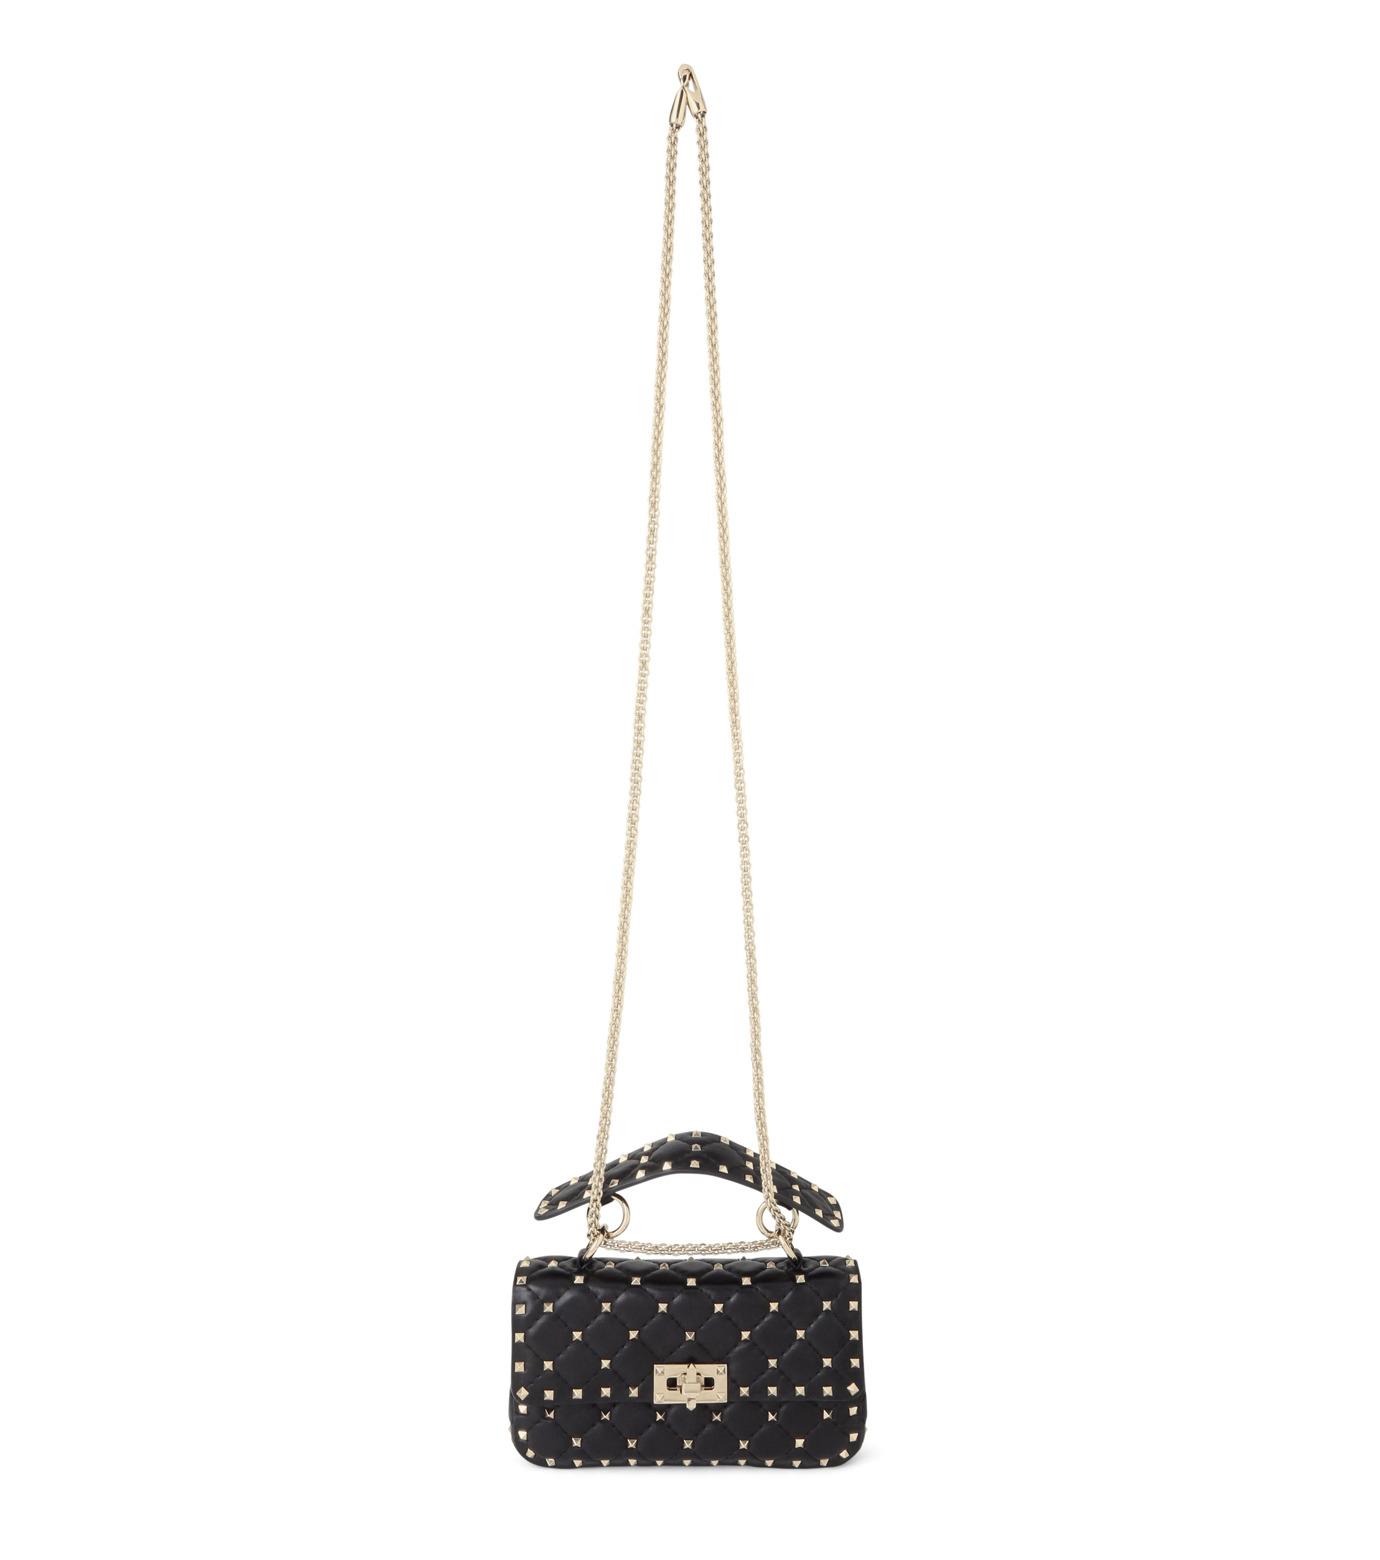 VALENTINO GARAVANI(ヴァレンティノ ガラヴァーニ)のRockstud Matelasse Small-BLACK(ショルダーバッグ/shoulder bag)-LW0B0123NAP-13 拡大詳細画像1